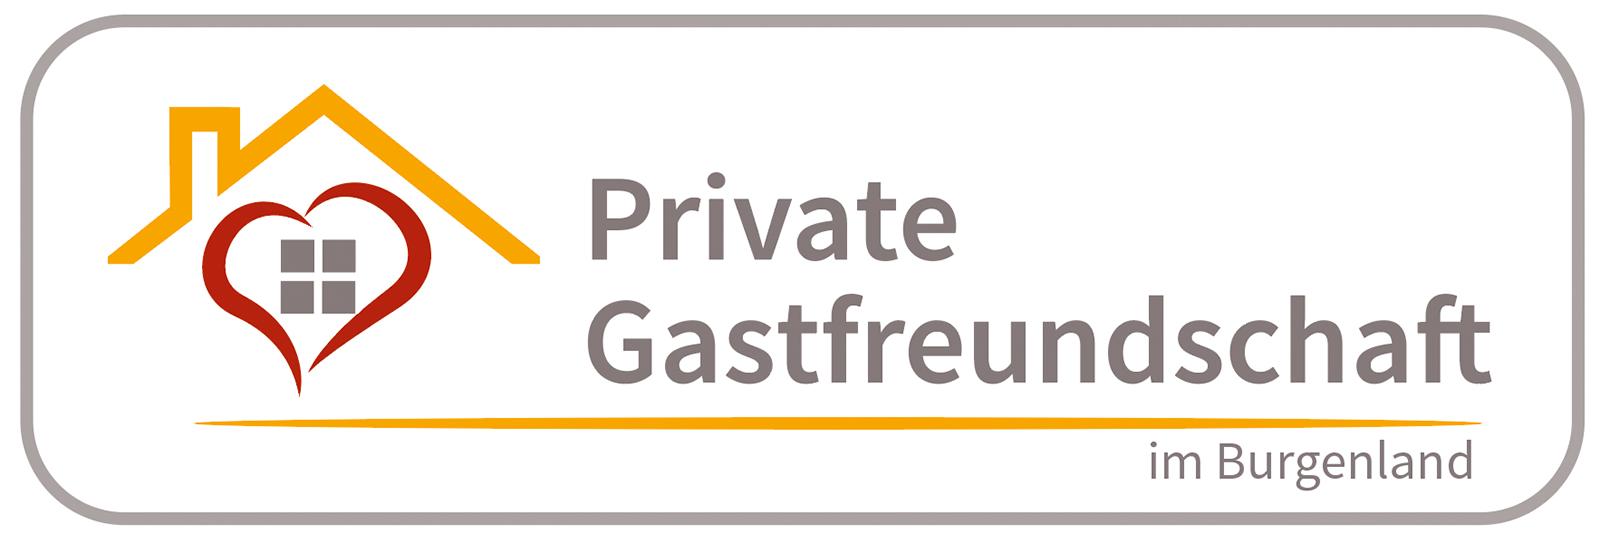 Private Gastfreundschaft